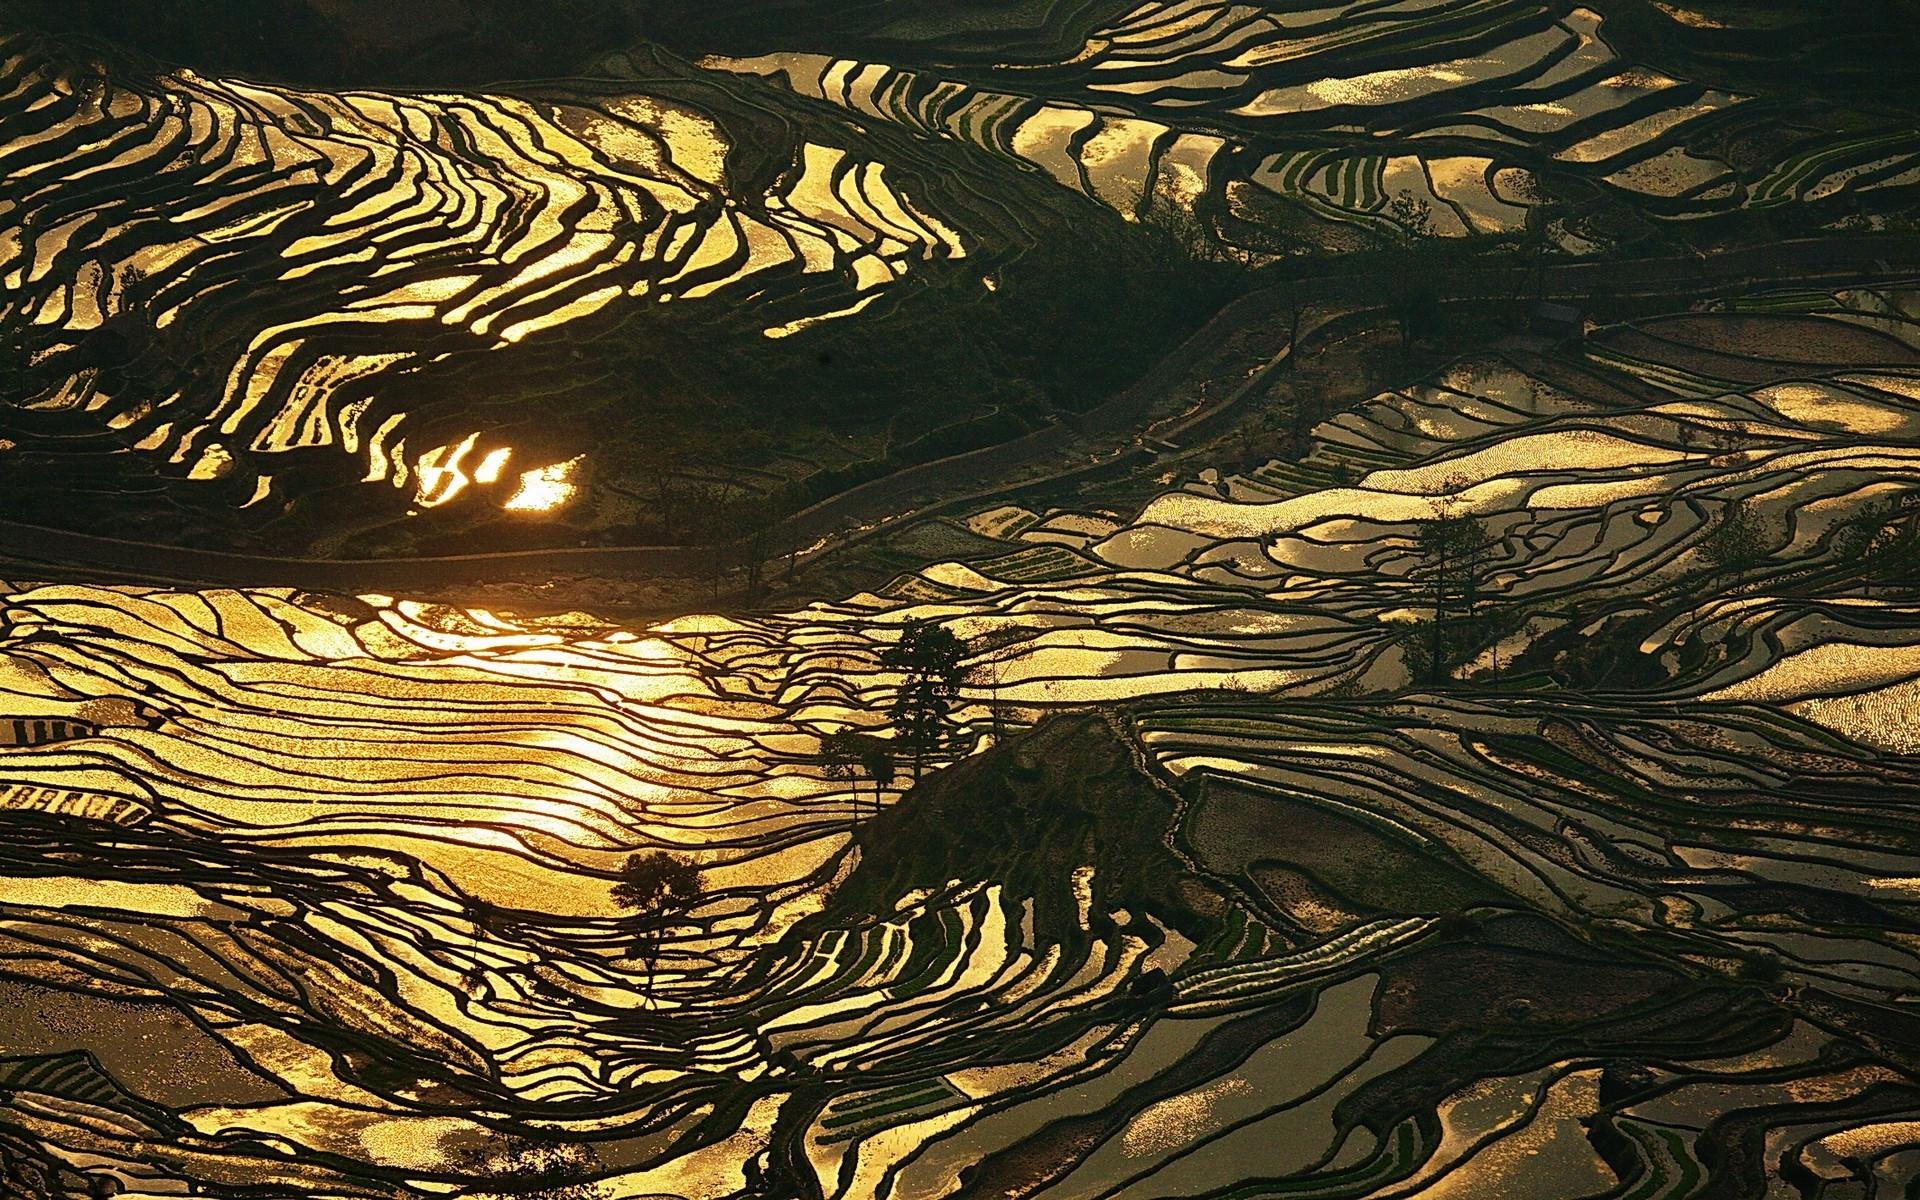 Fondos De Pantalla 1920x1200 Px China Oro Paisaje